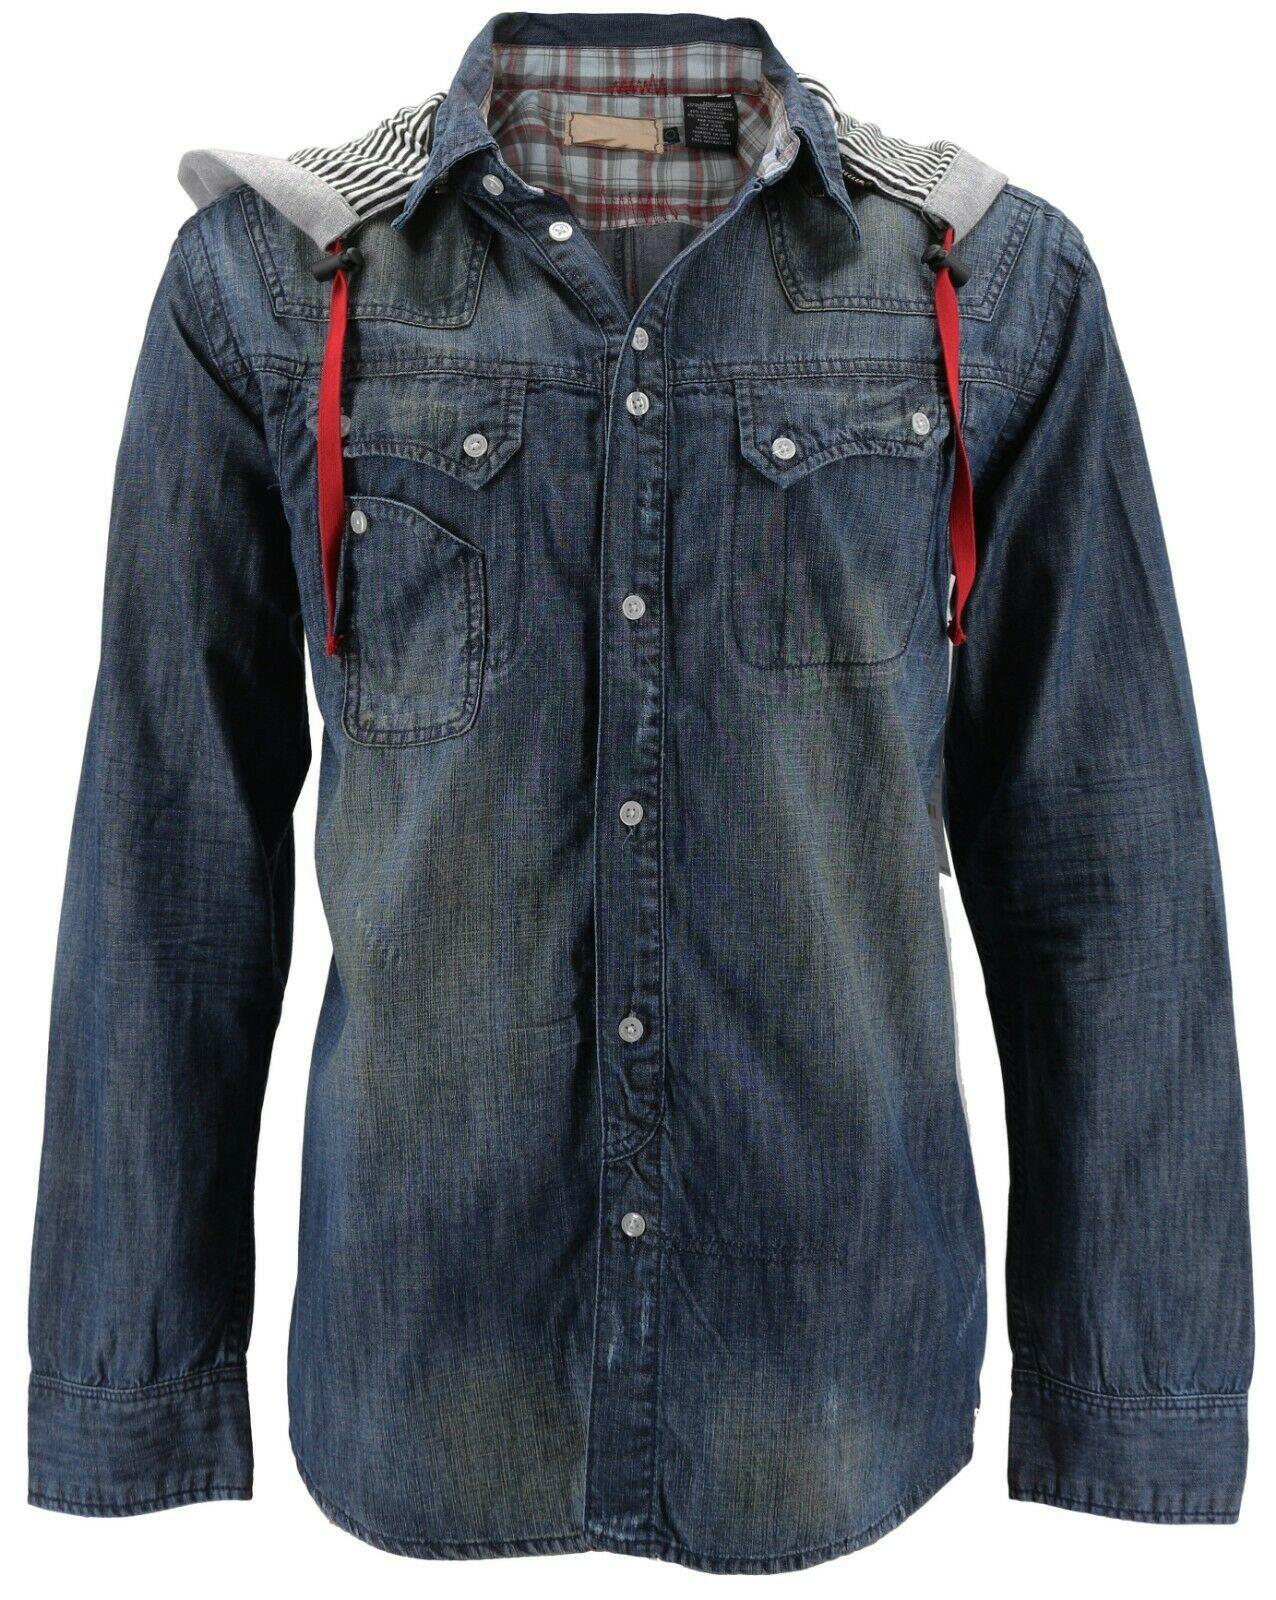 Men's Distressed Vintage Woven Hooded Denim Jean Cobain Shirt Jacket